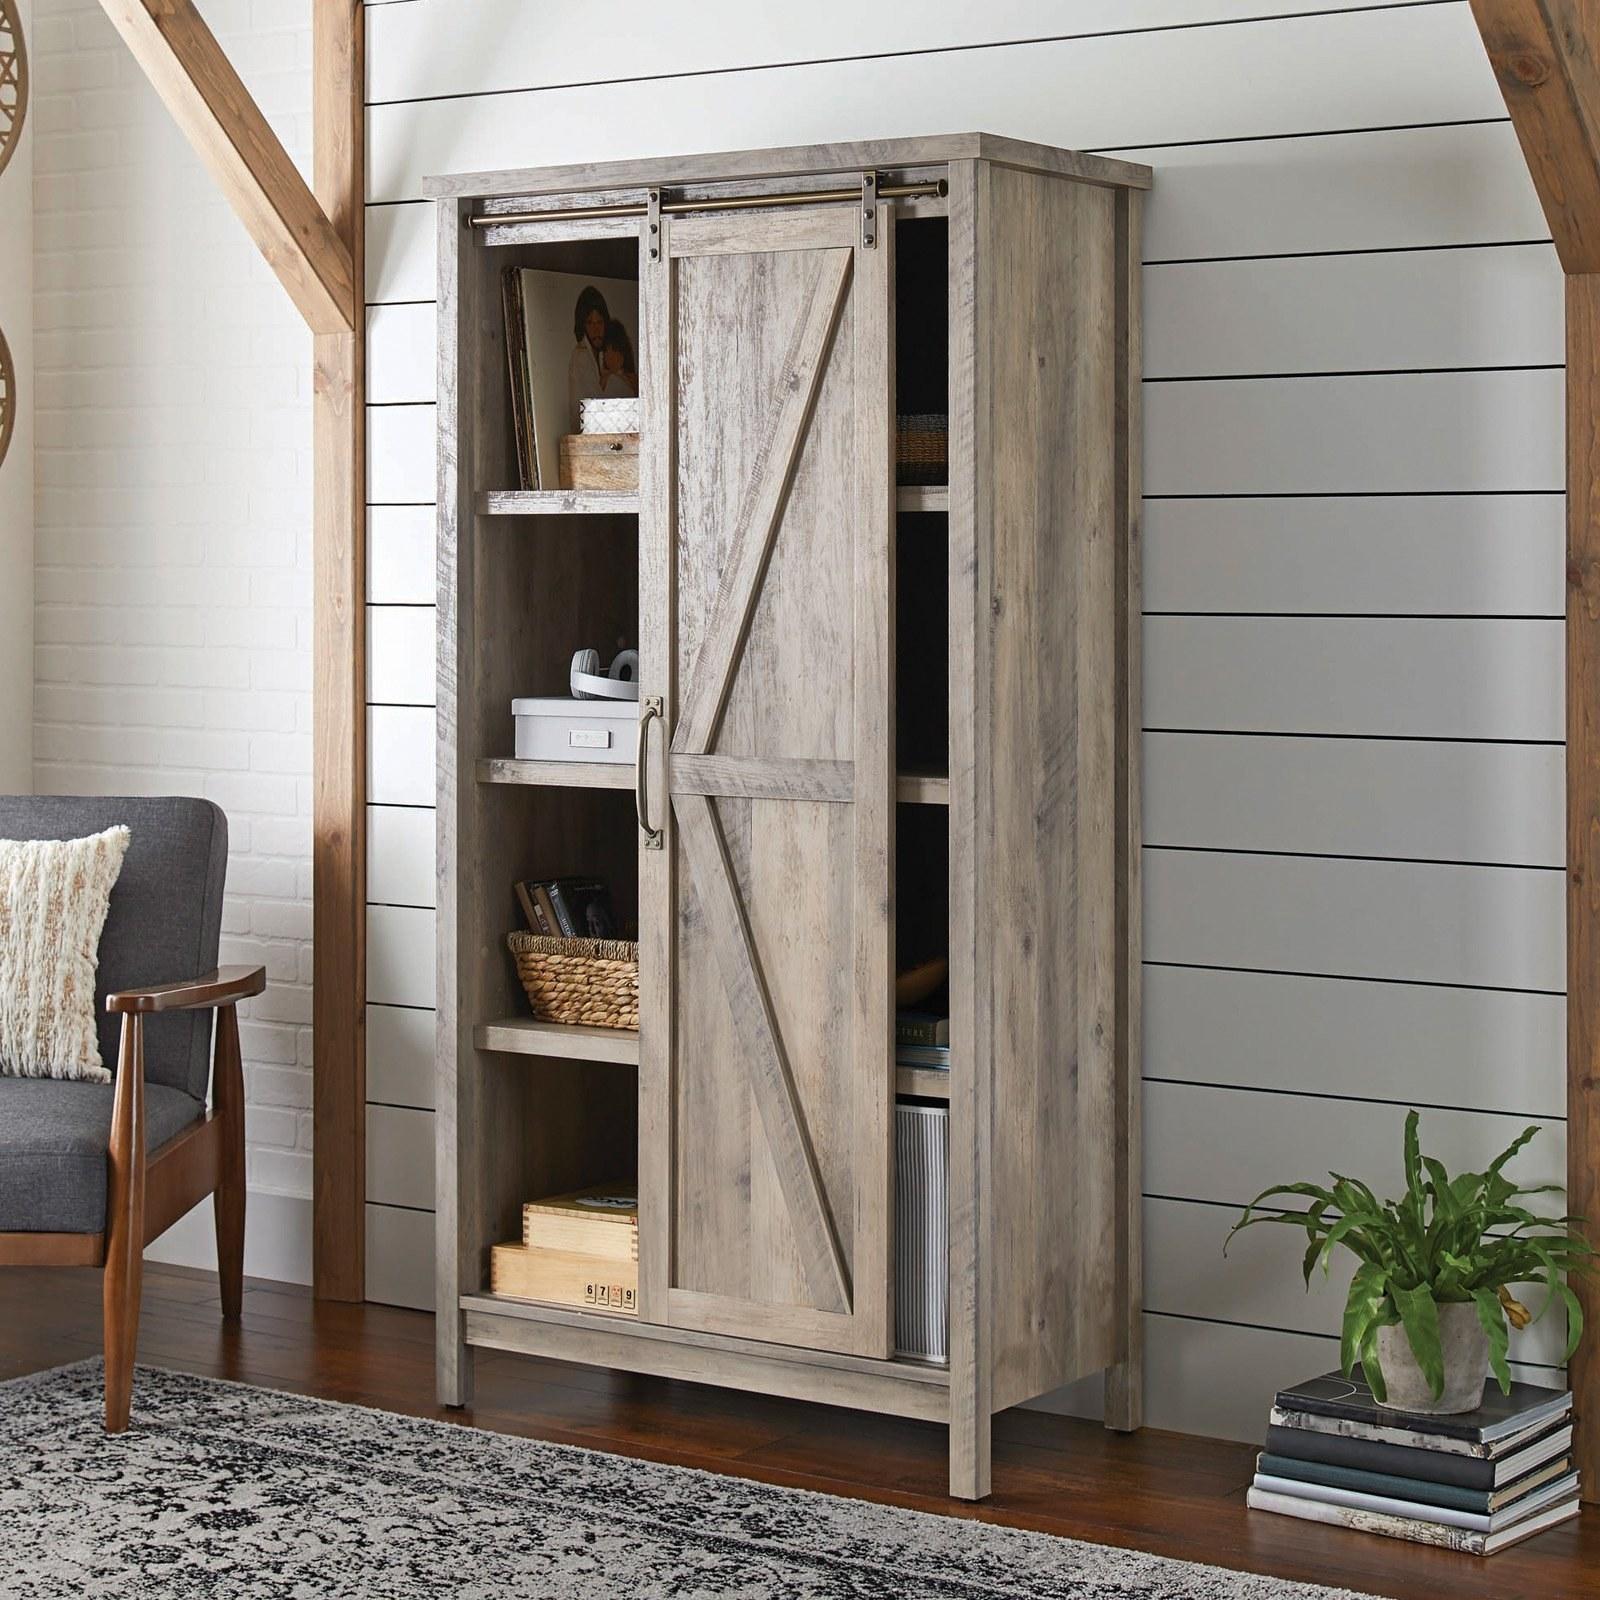 Modern rustic wooden bookshelf/cabinet